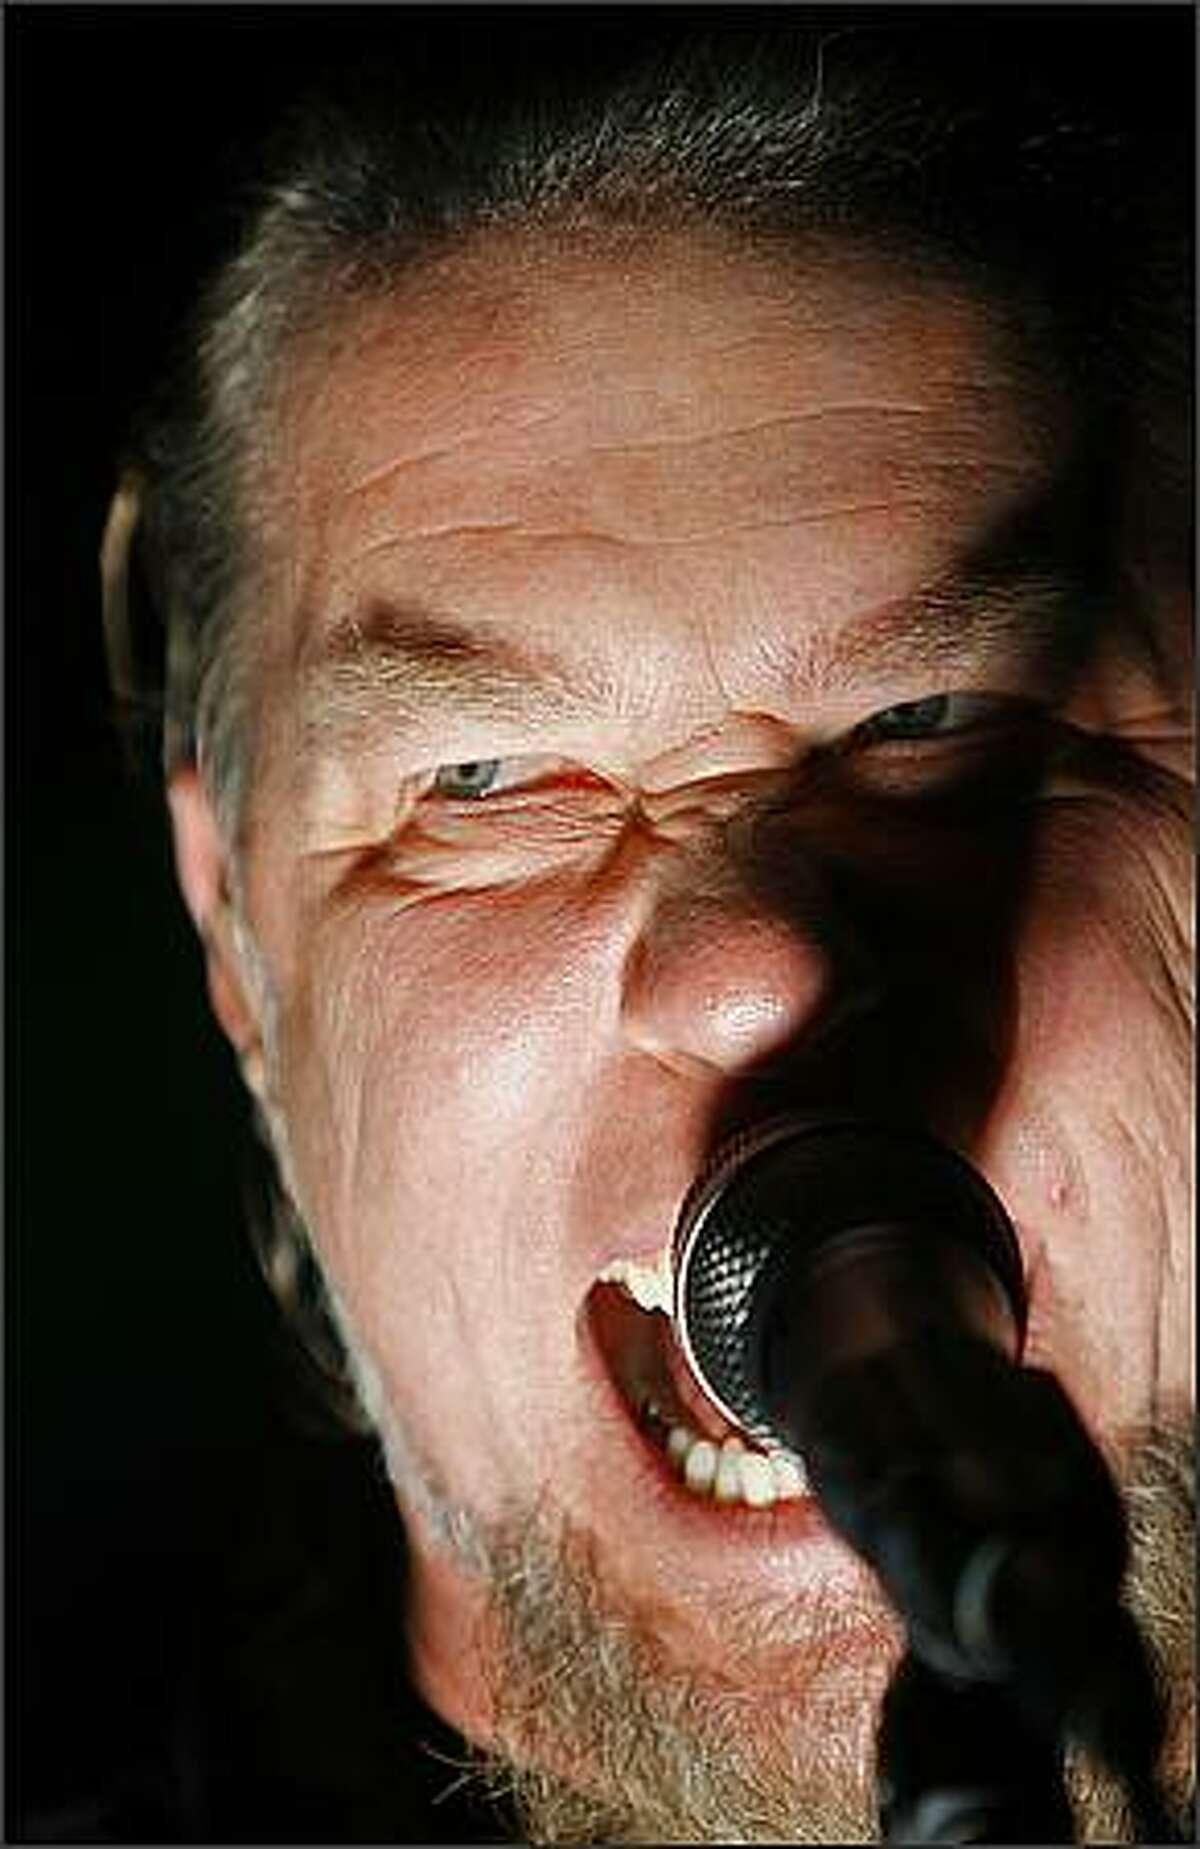 Metallica's lead vocalist James Hetfield plays KeyArena in Seattle.